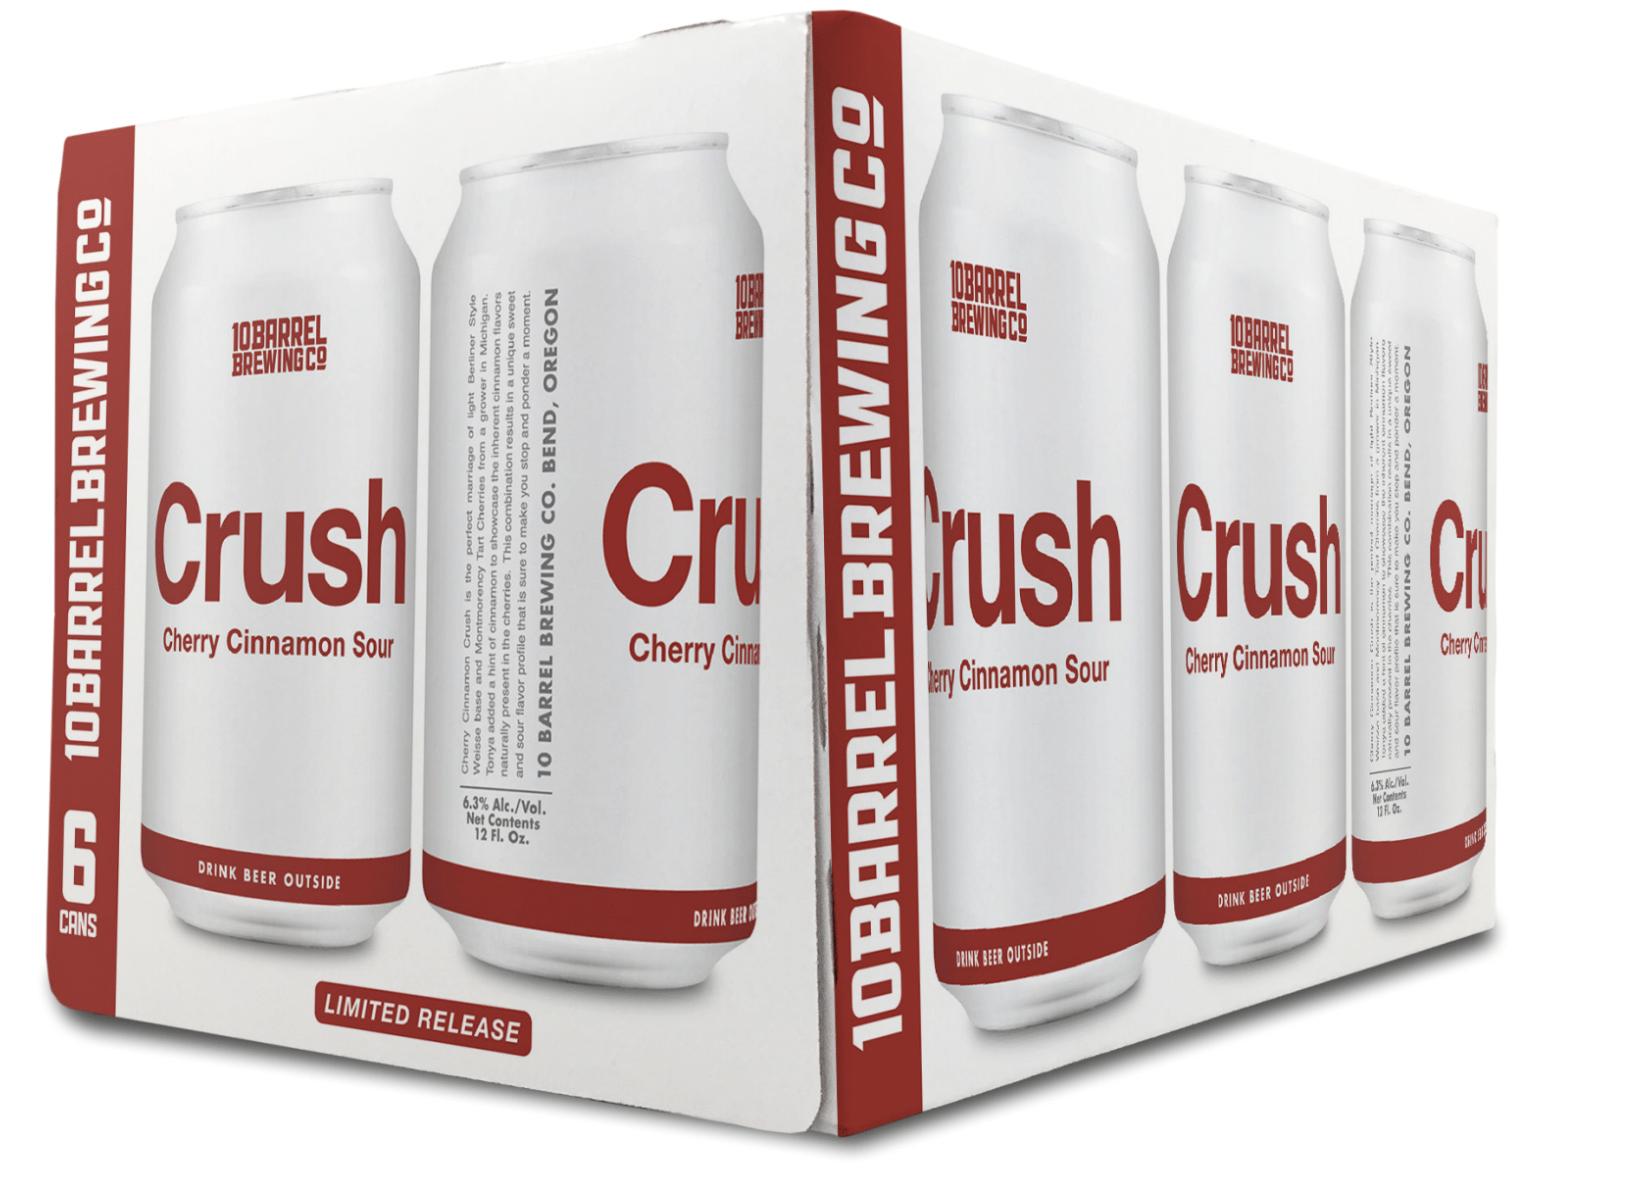 gifts-under-$50-10Barrel-cherry-cinnamon-crush.png